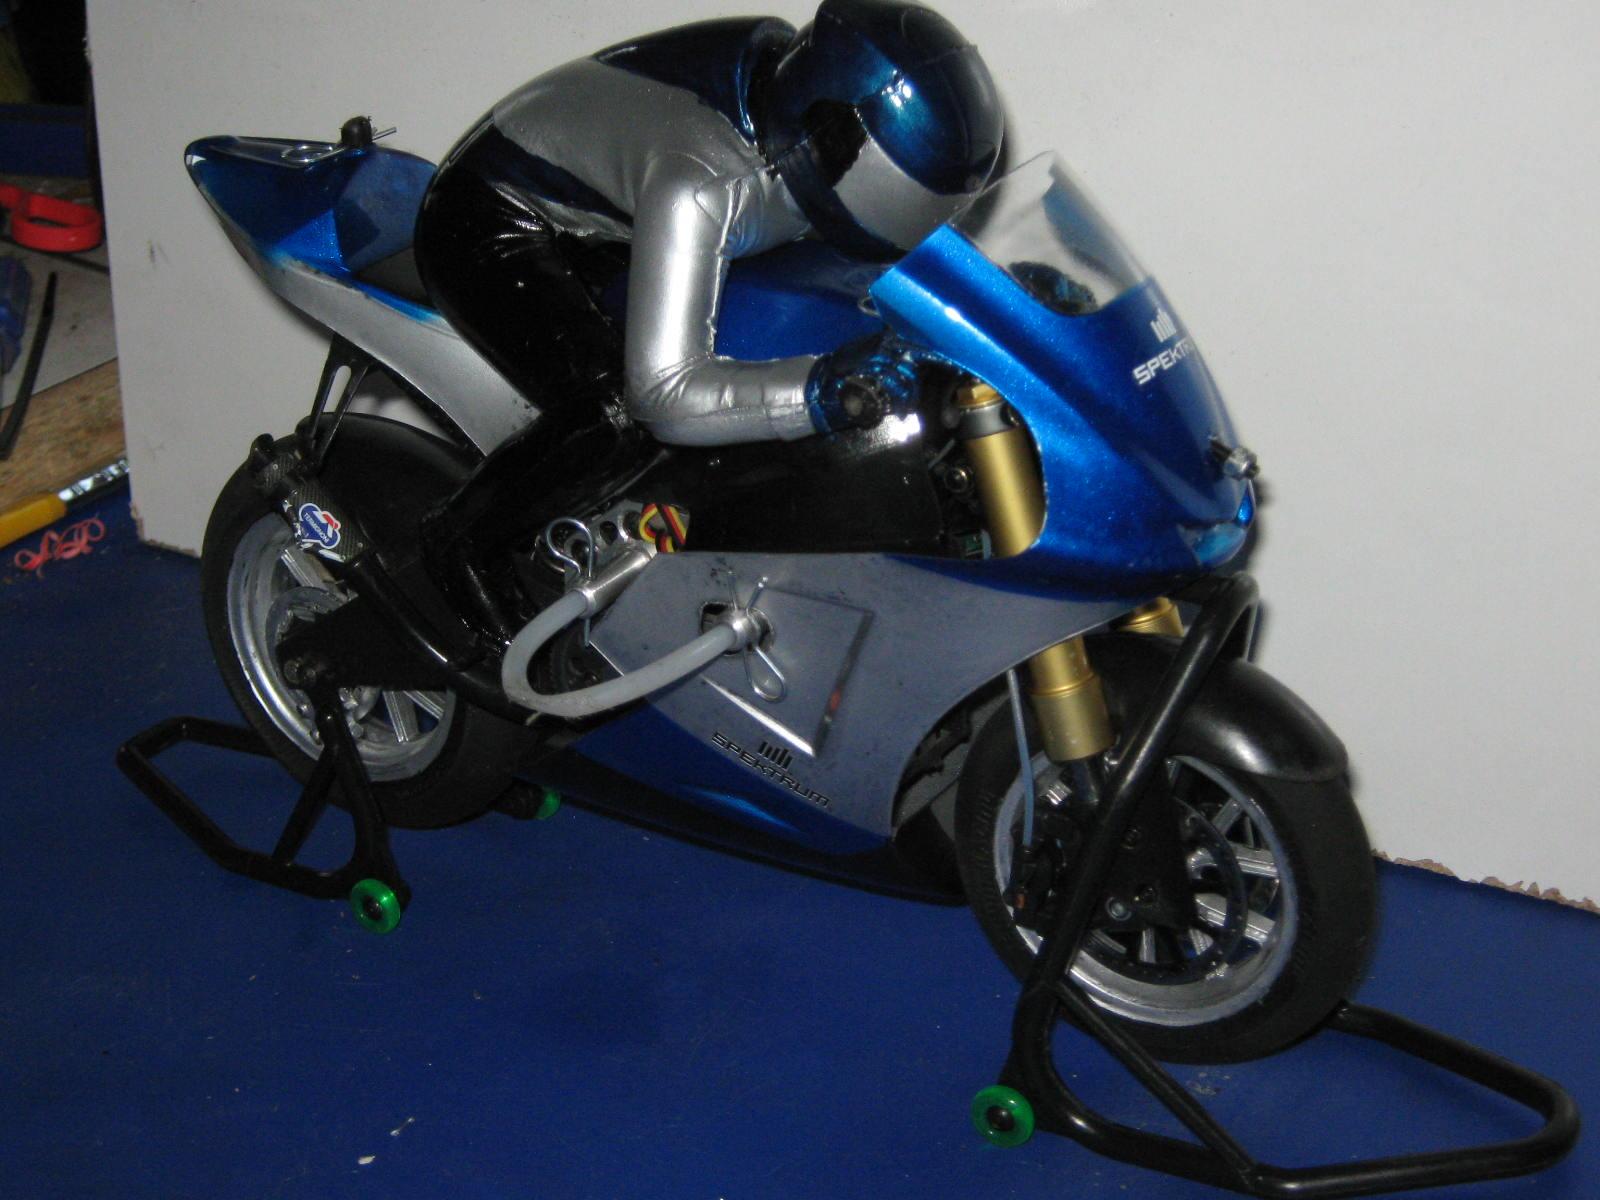 428689d1236897197 rc bikes adelaide venom gpv 1 041 Free Gay Gallery // Let's